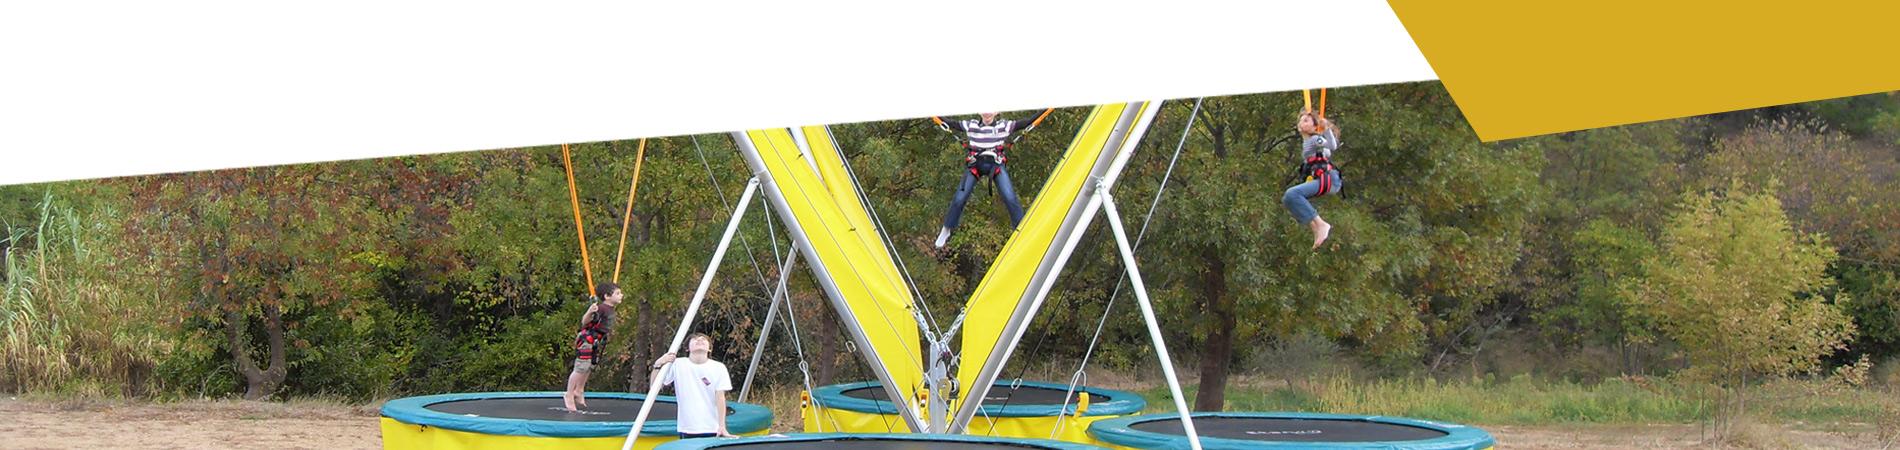 bungy_trampoline